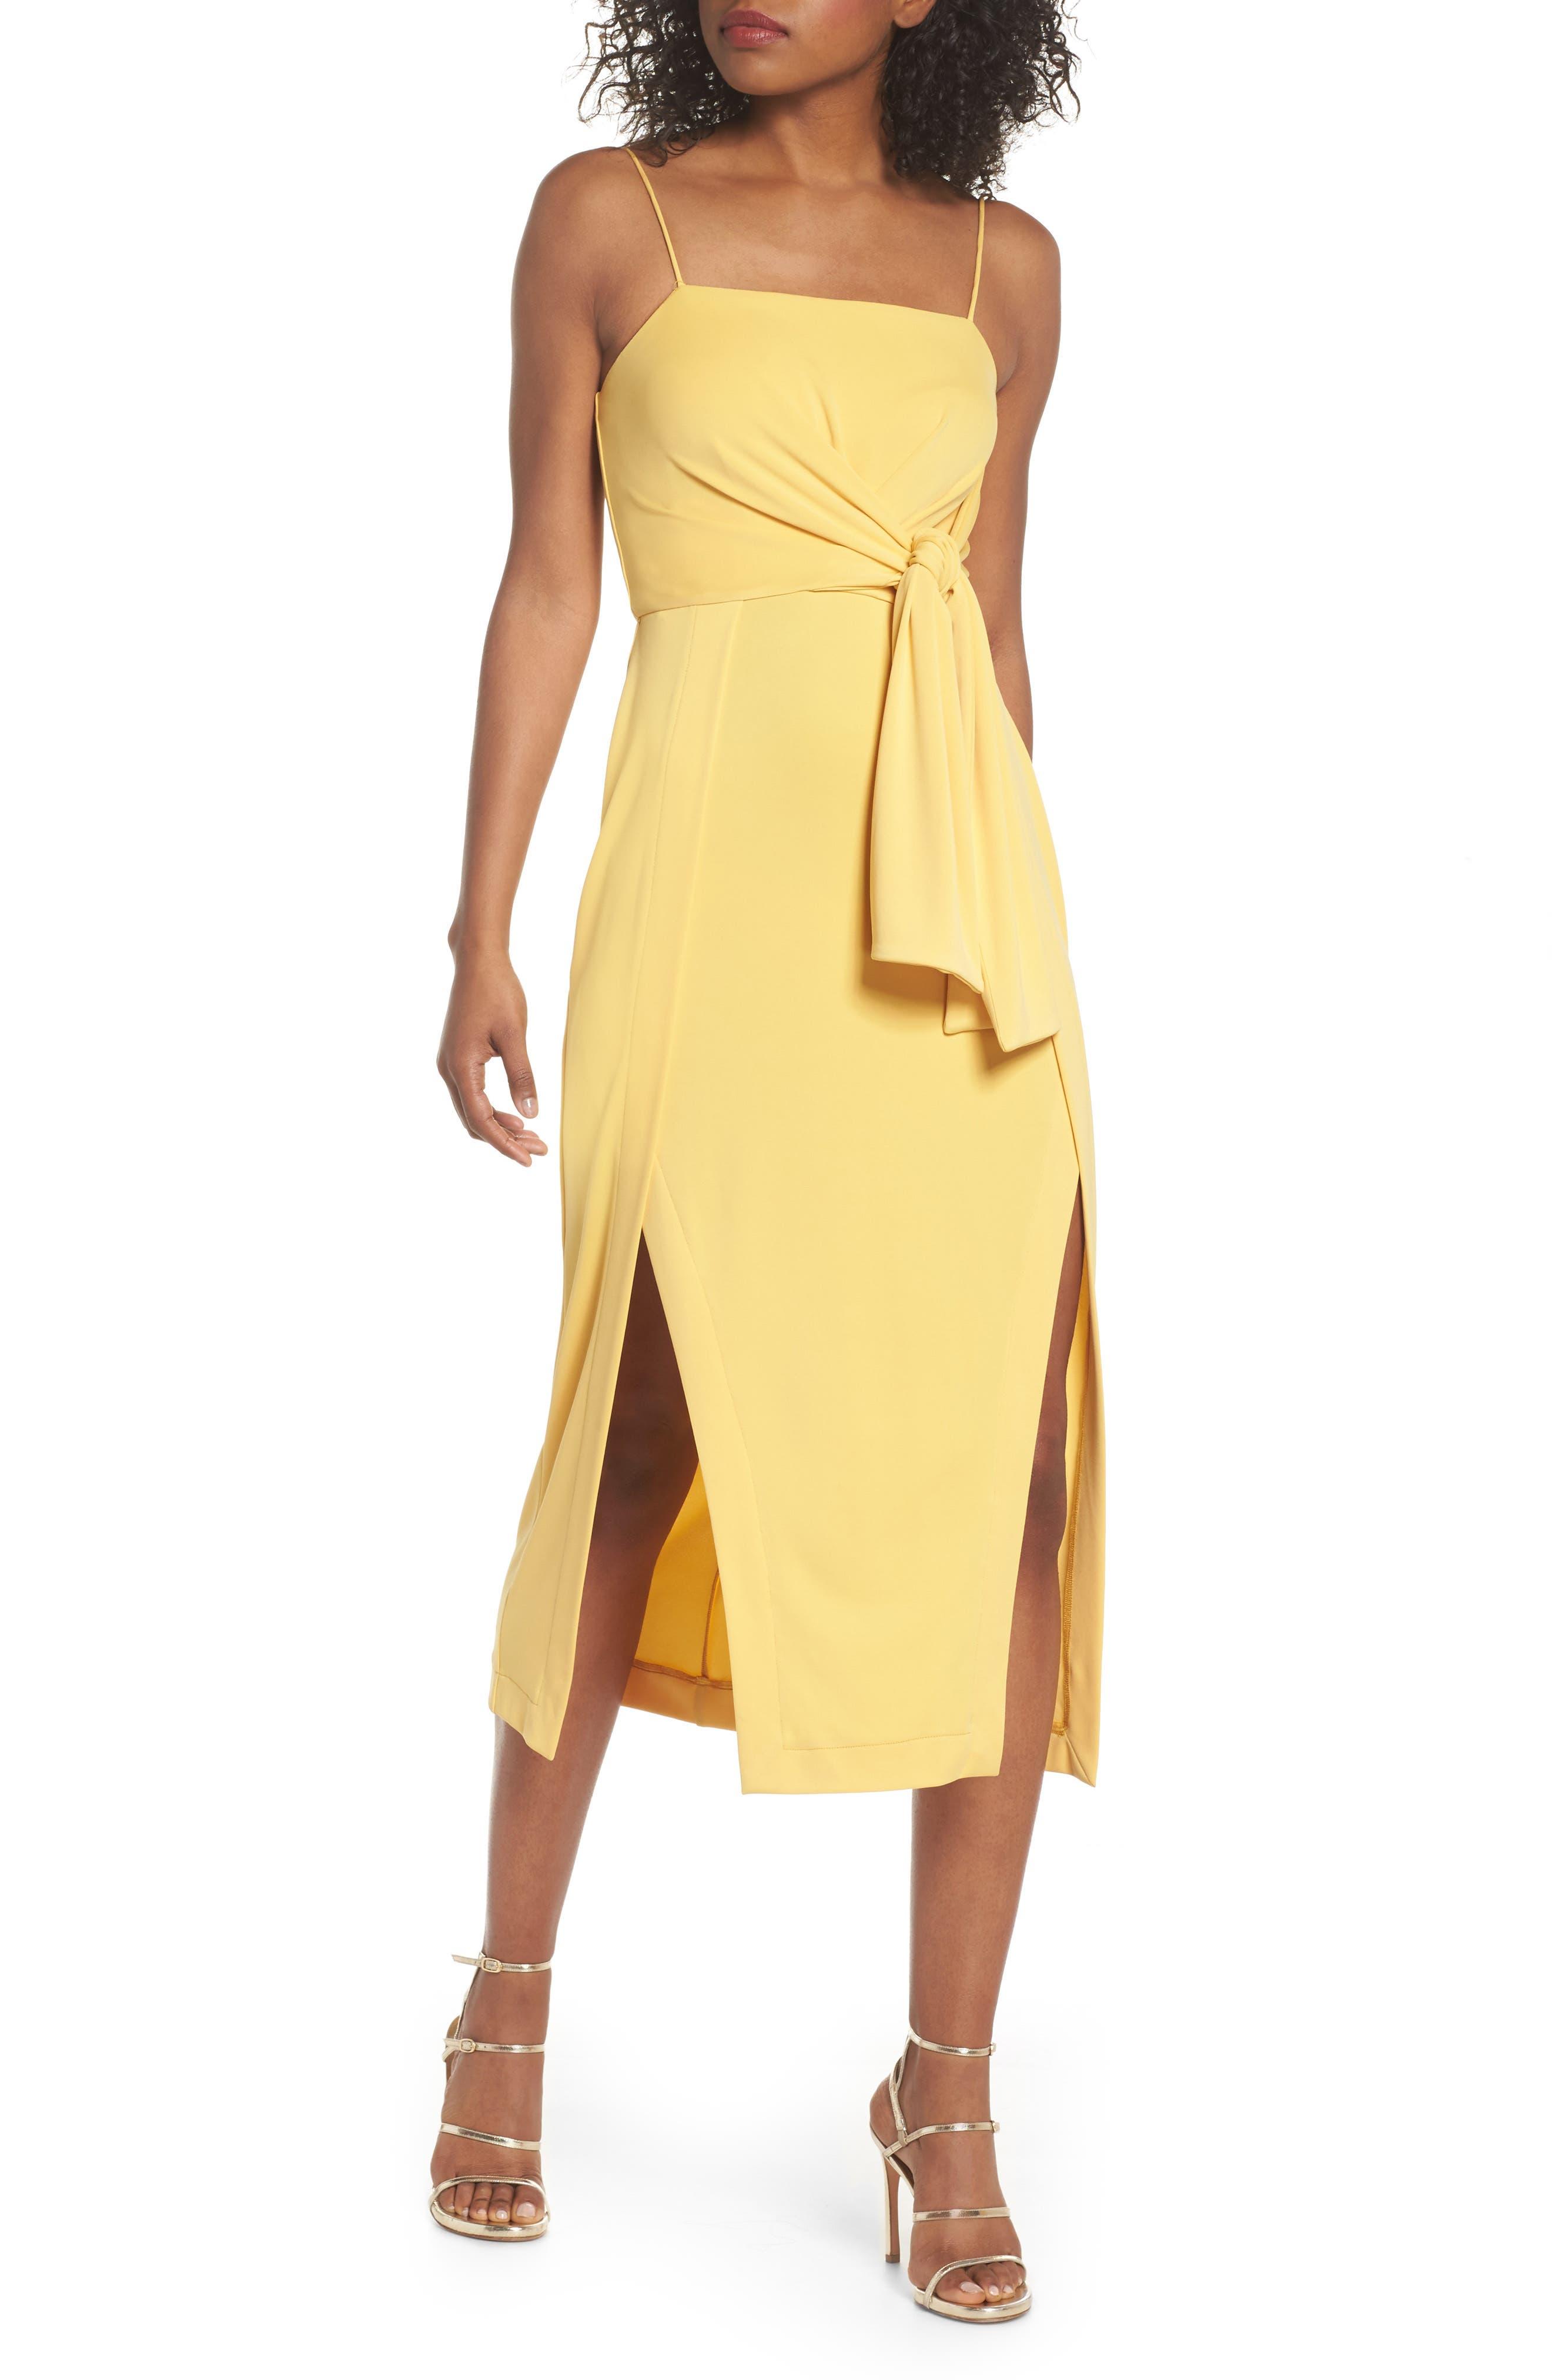 Recollect Slinky Side Tie Midi Dress,                             Main thumbnail 1, color,                             Honey